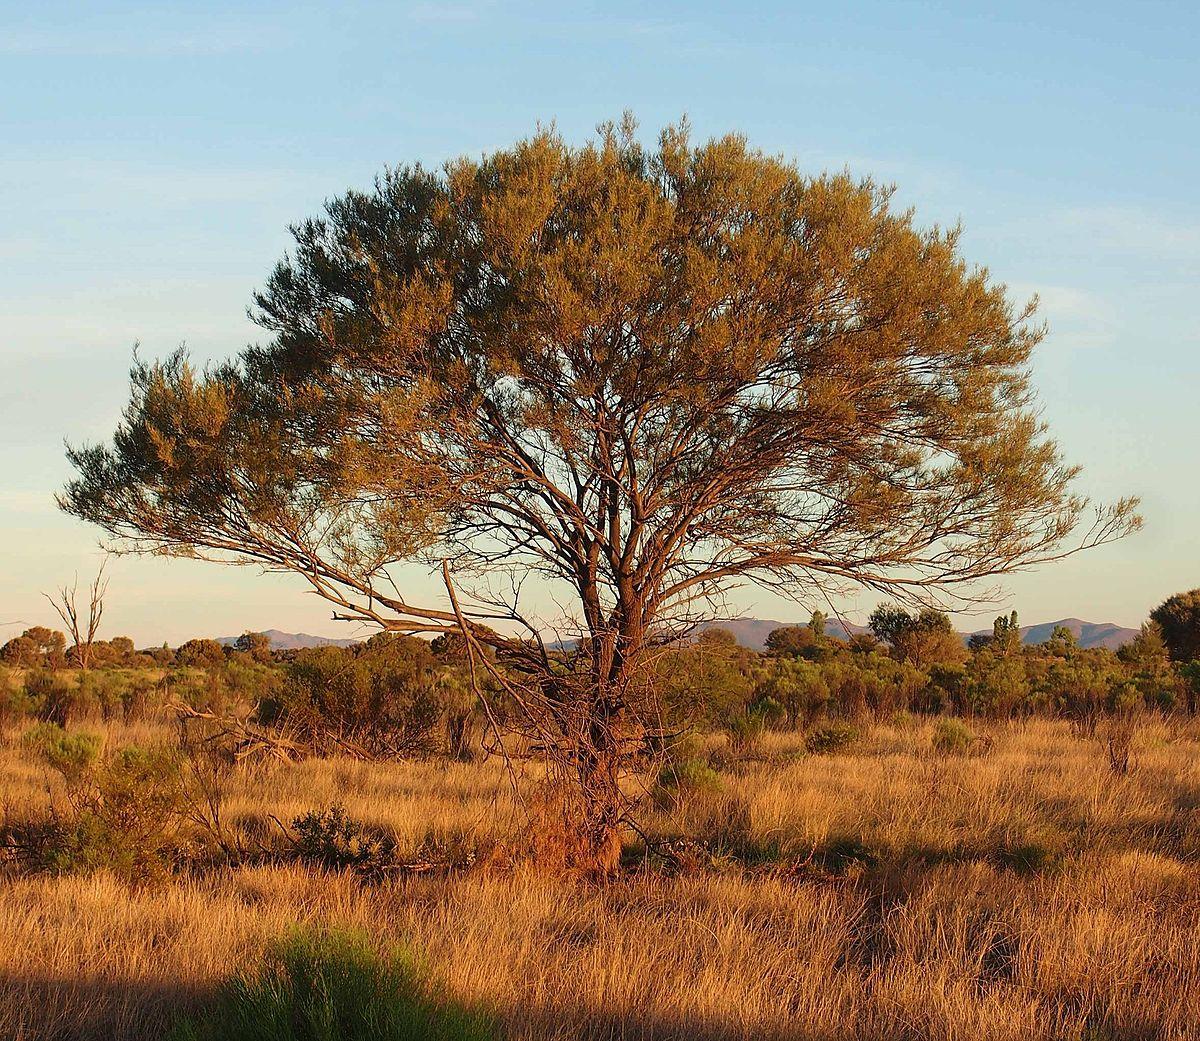 acacia arbre